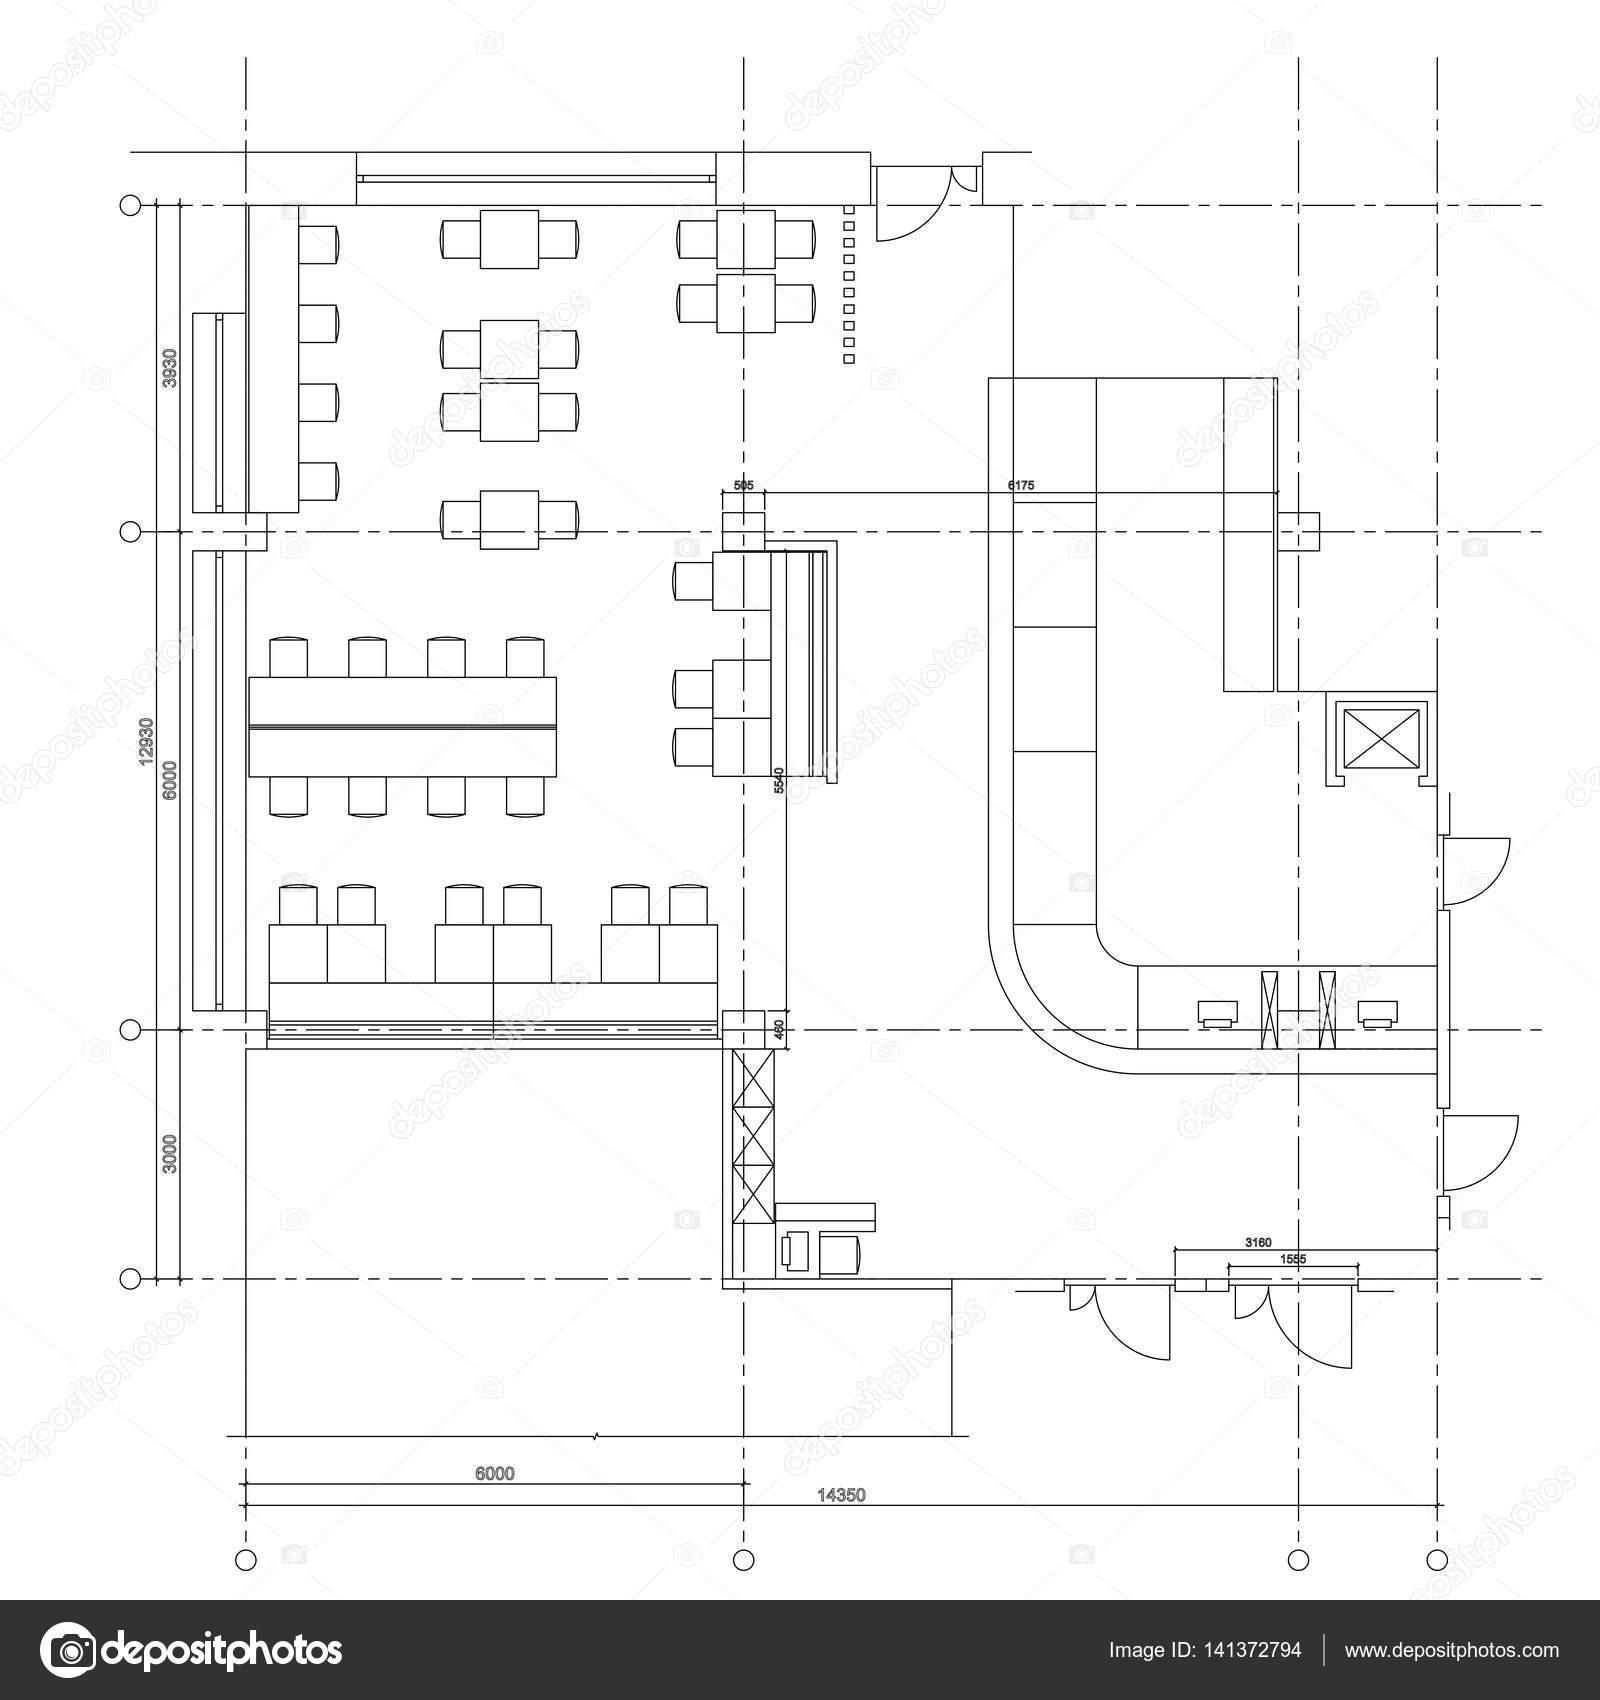 drawing furniture plans. Standard Cafe Furniture Symbols On Floor Plans \u2014 Stock Vector Drawing